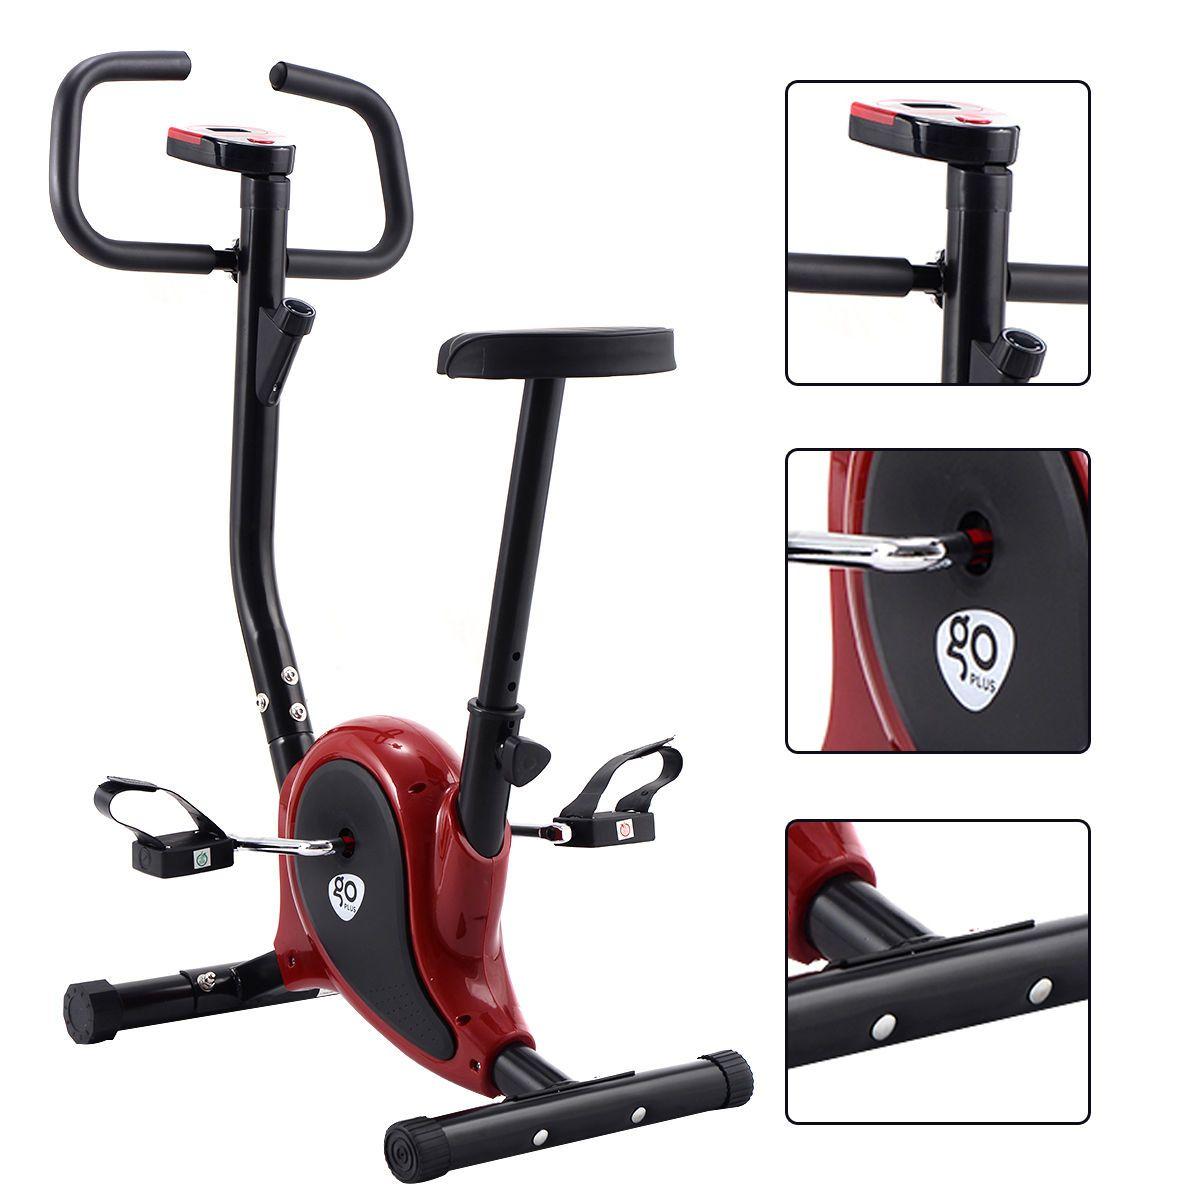 Exercise Bike Stationary Cycling Fitness Cardio Aerobic Equipment